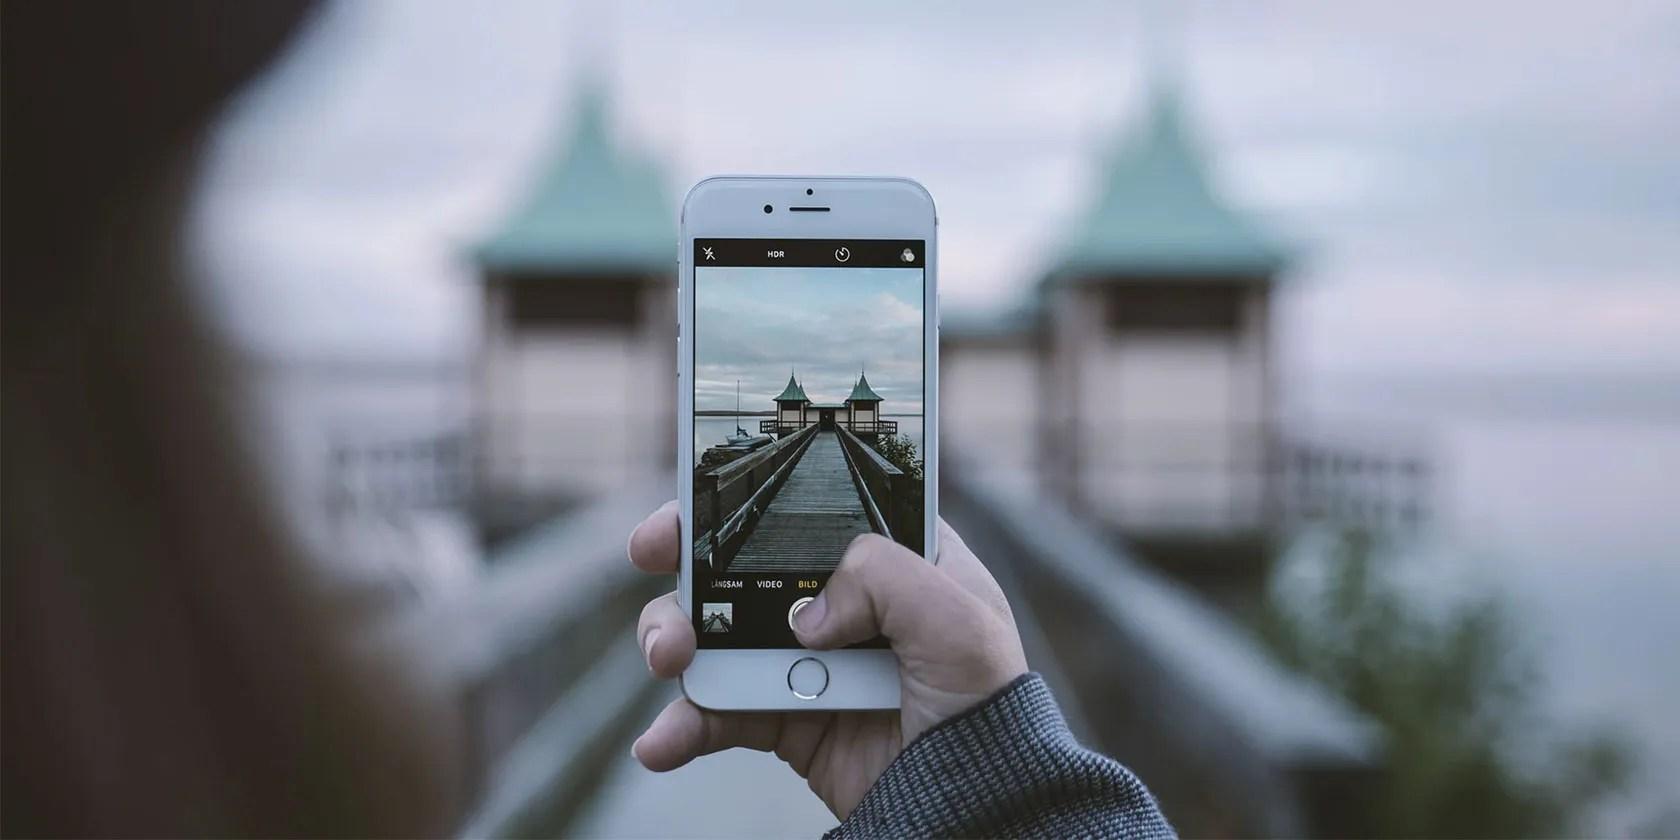 iphone-photo-sync